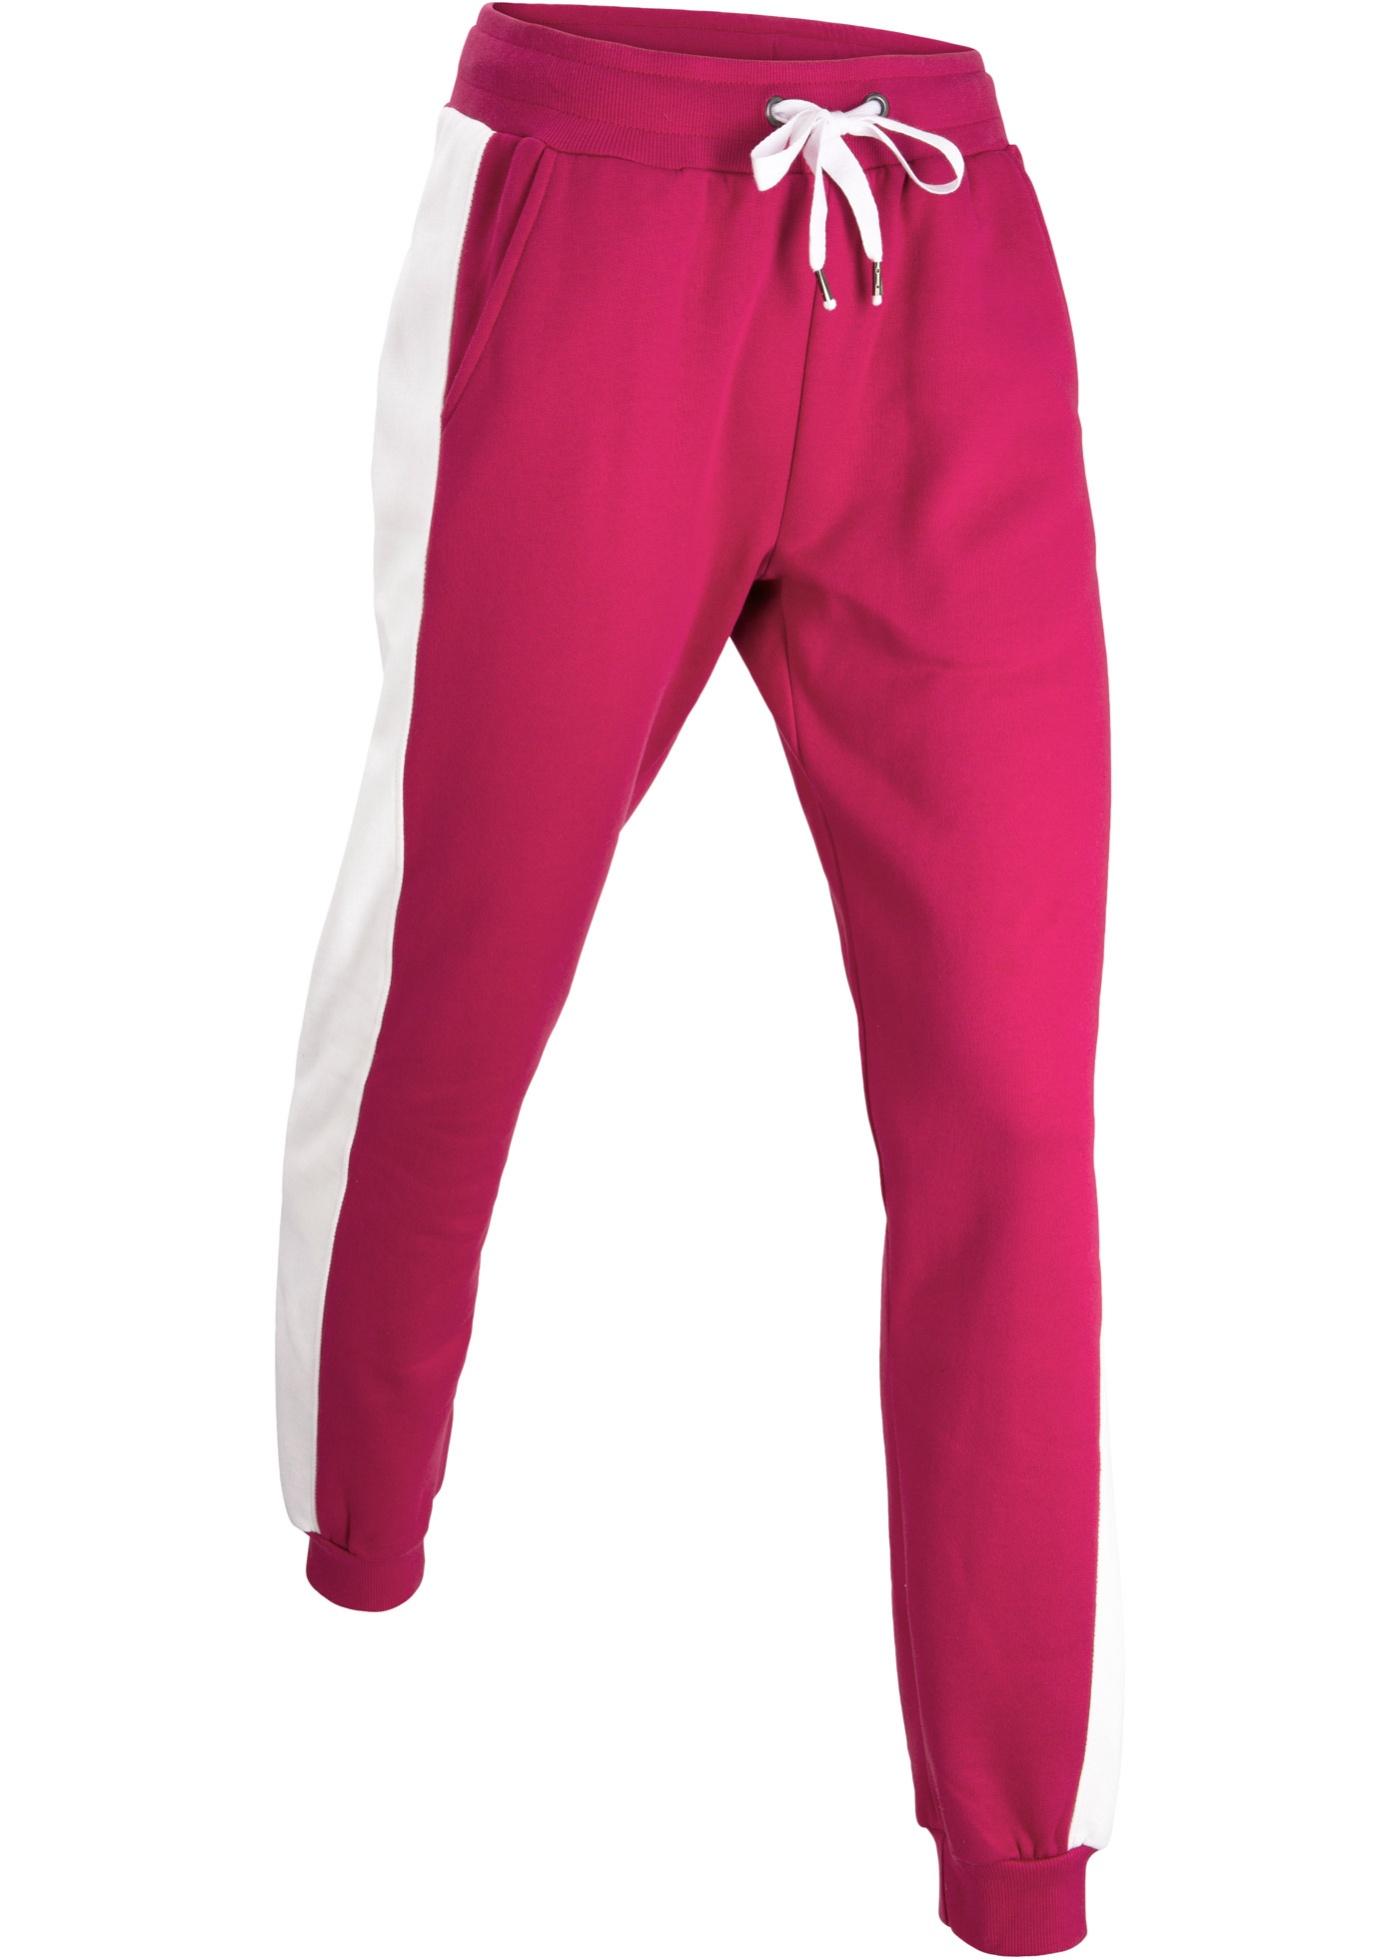 Pour De Jogging Fuchsia 1 Bonprix CollectionPantalon CotonLongNiveau En Bpc Femme 6gvIfbyY7m